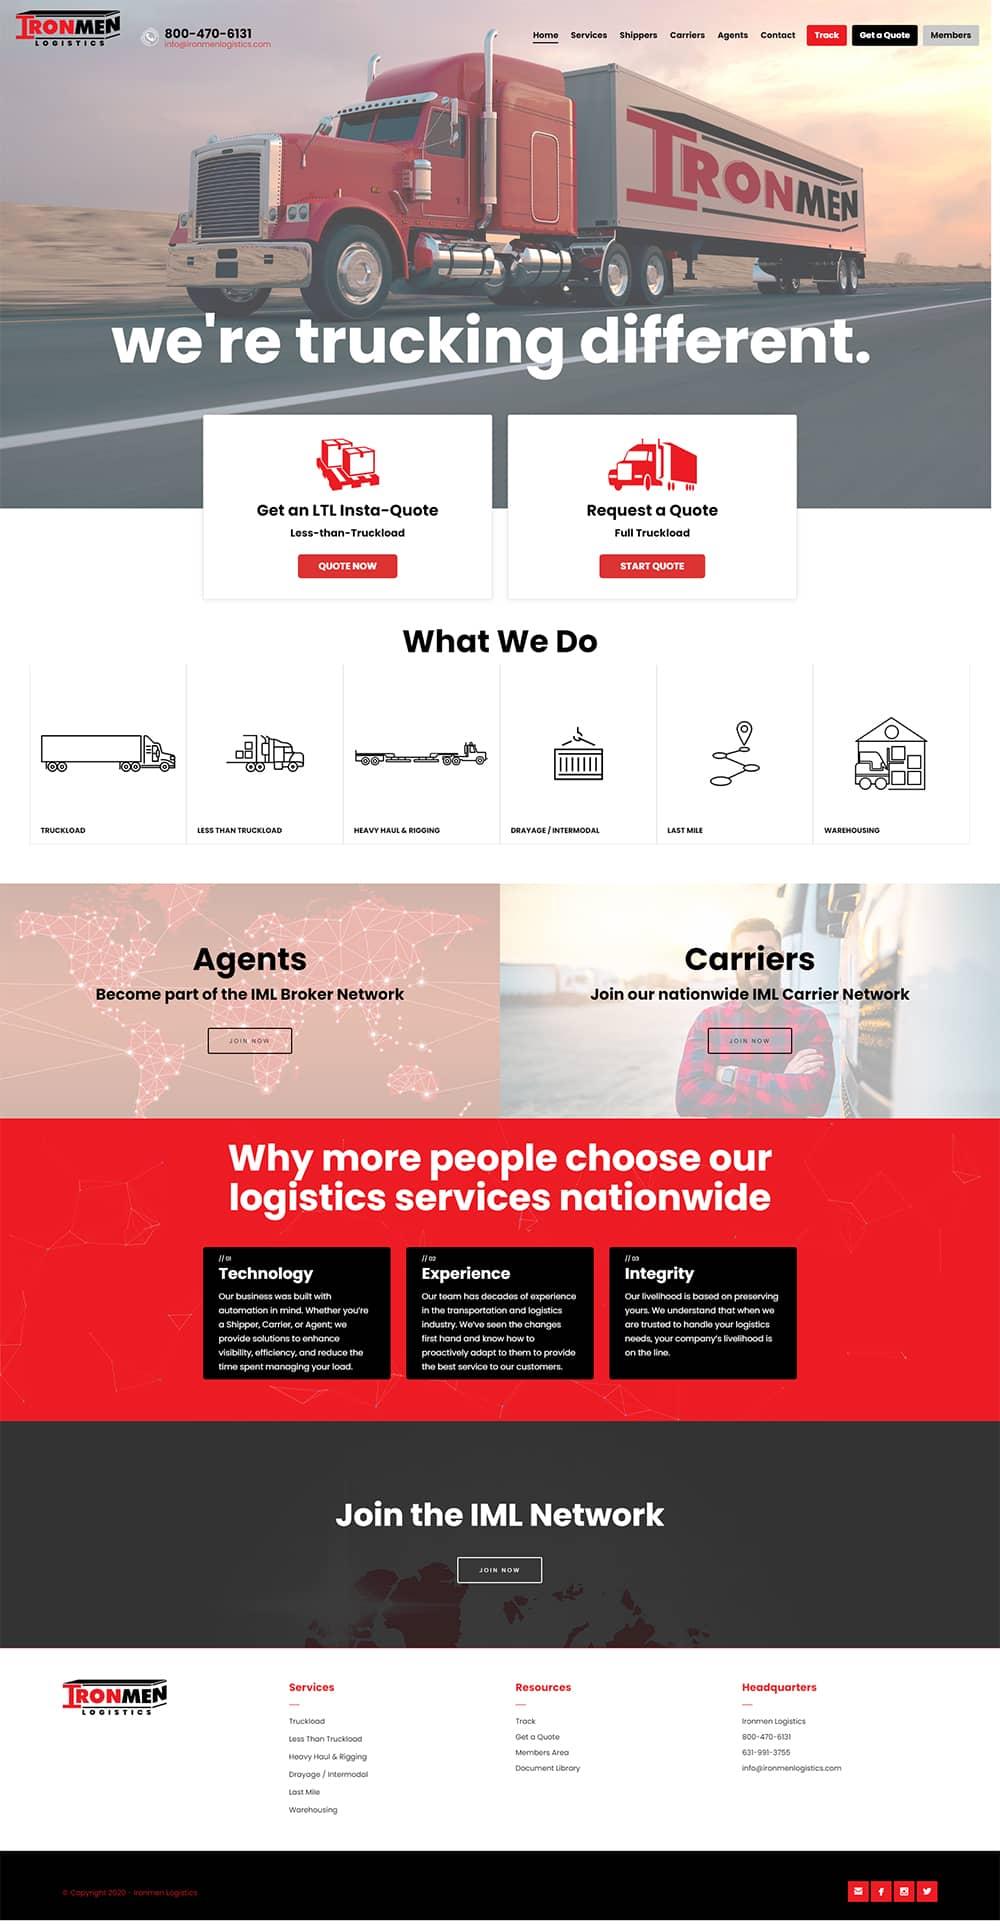 ironmen logistics web design